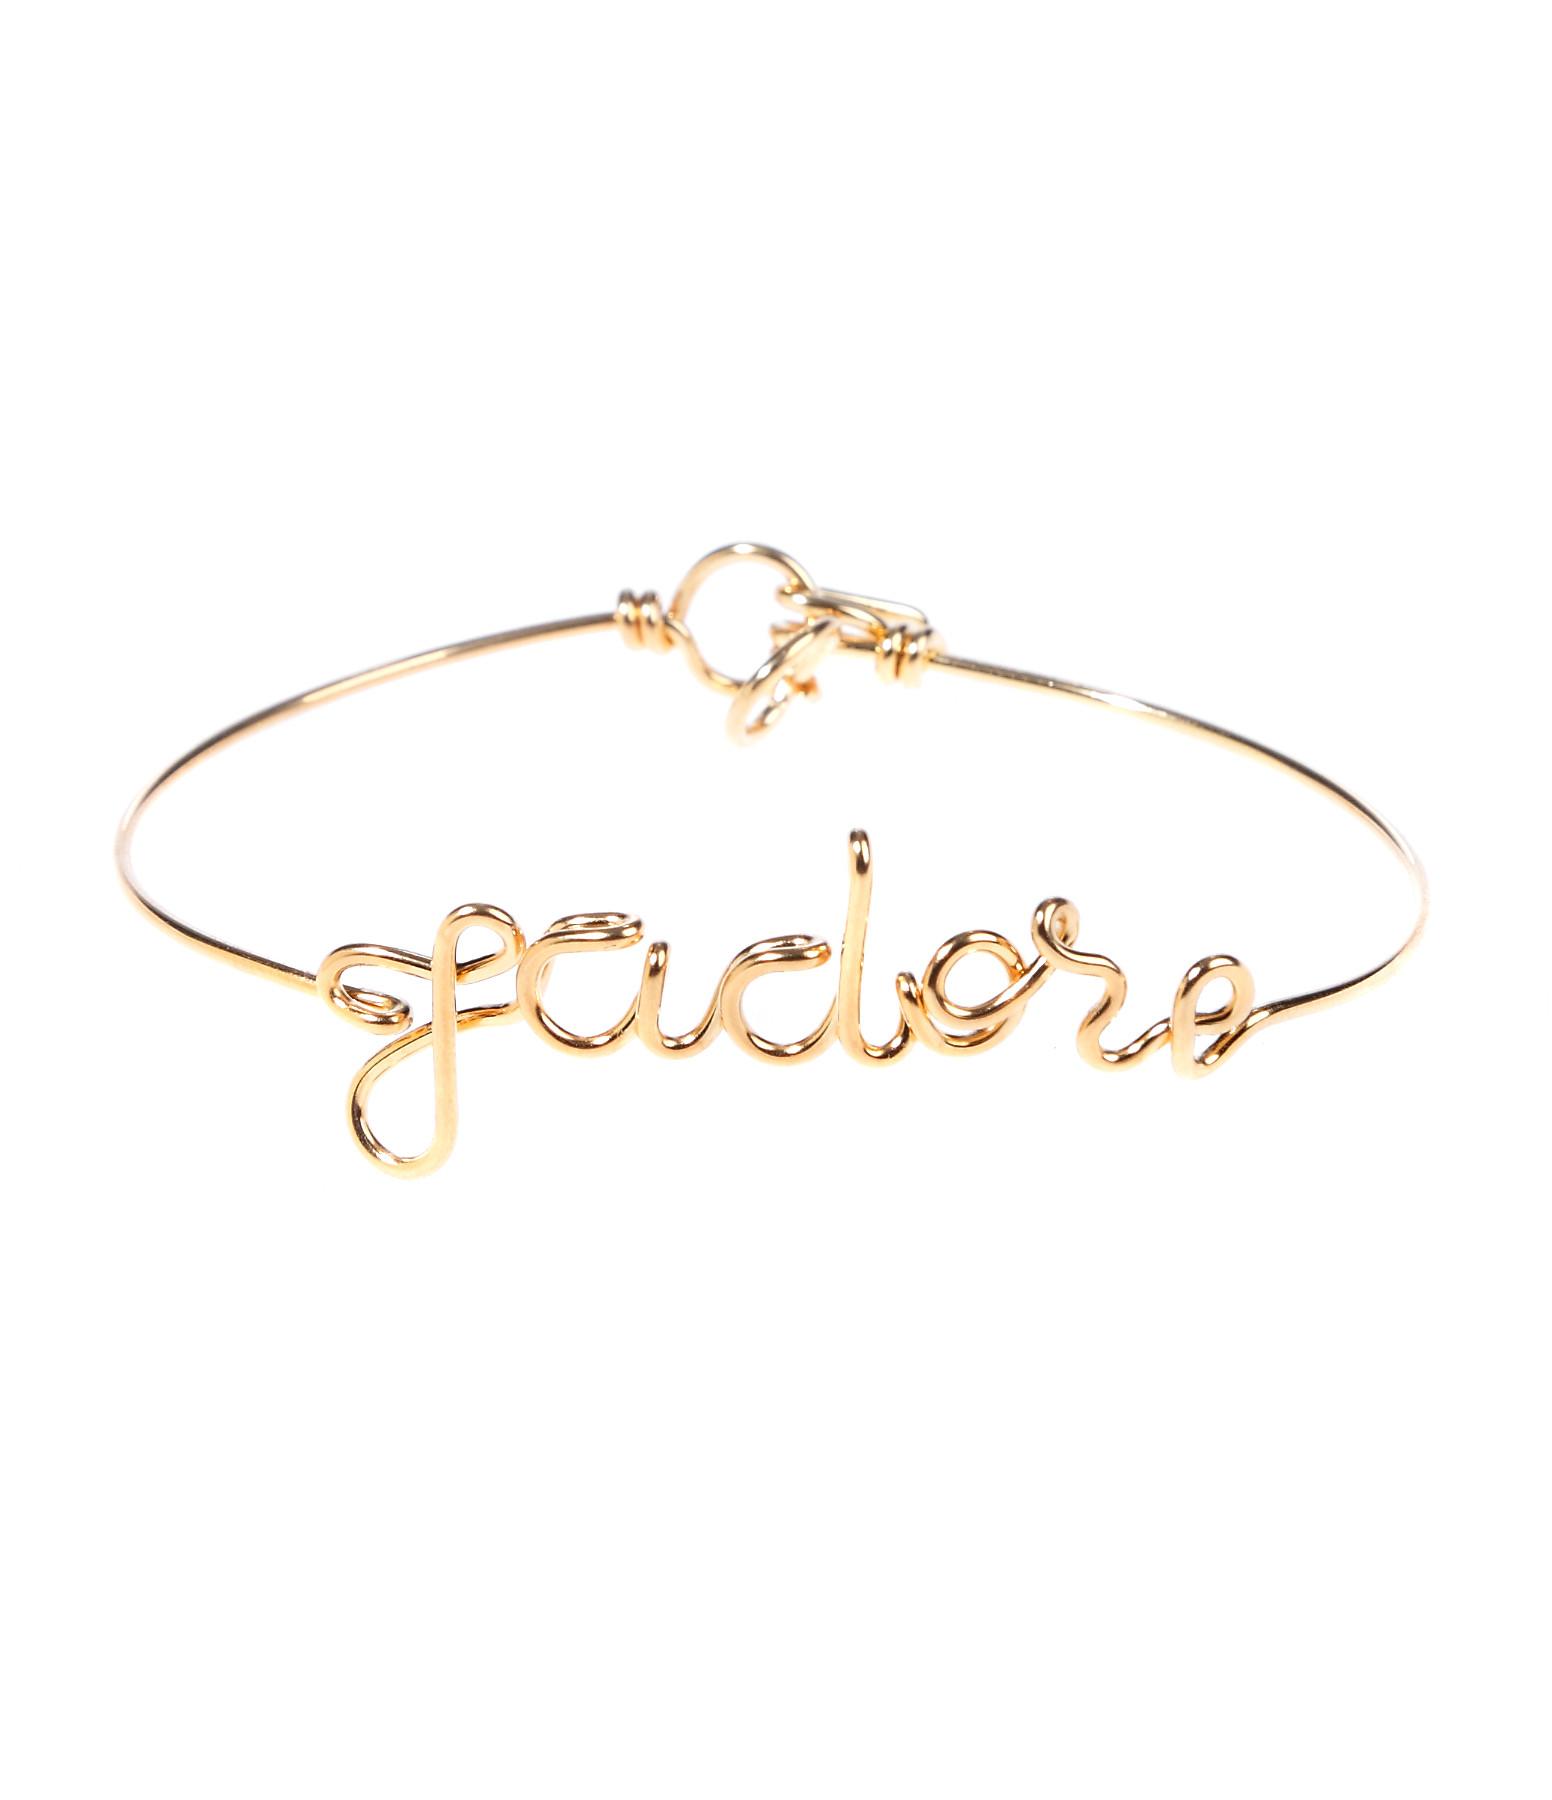 Bracelet Fil Exclu Lulli Jadore Gold Filled - ATELIER PAULIN